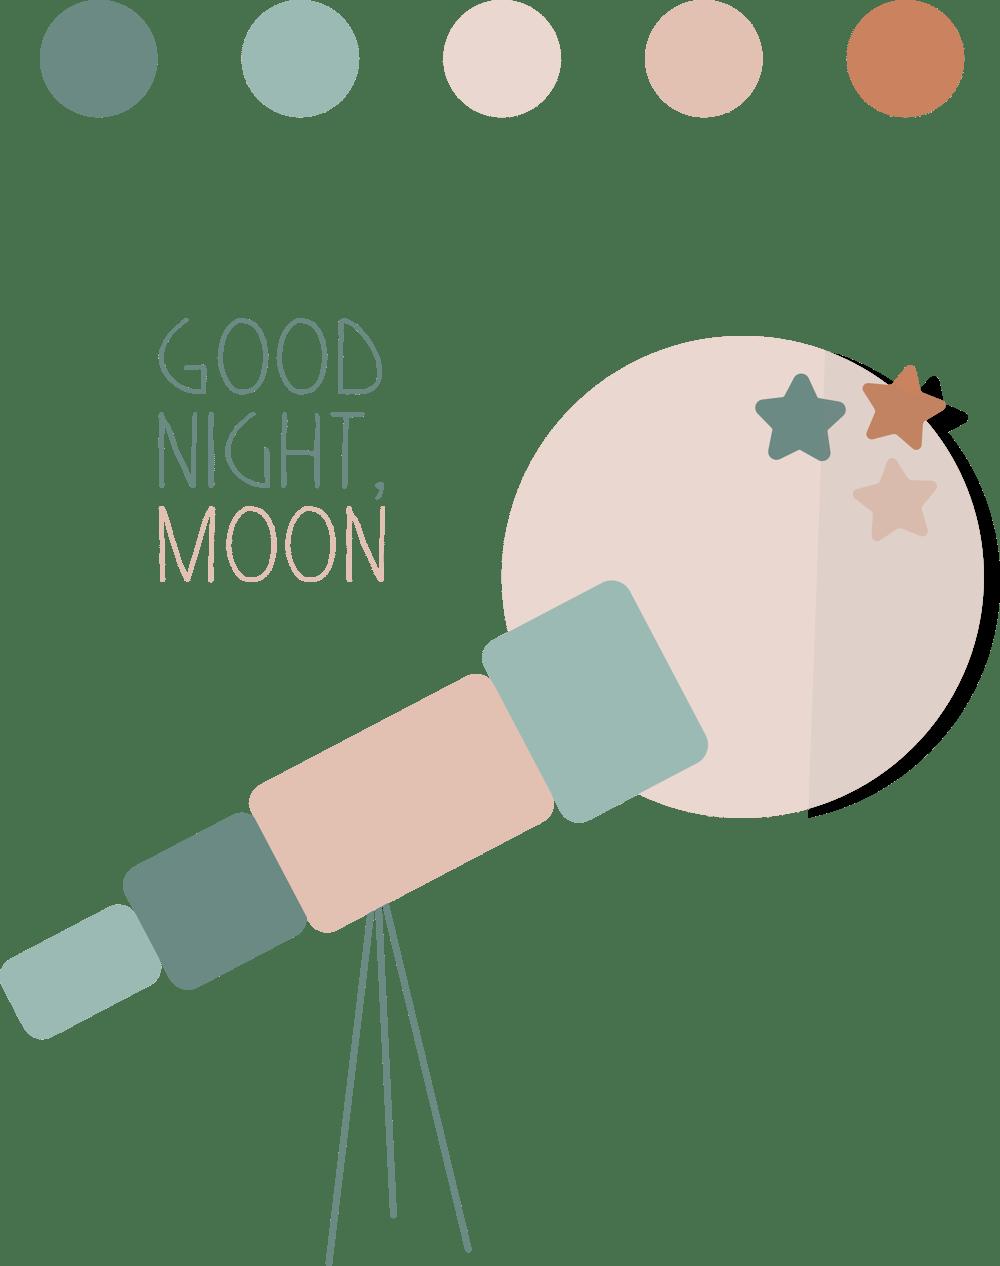 Good night, moon - image 1 - student project